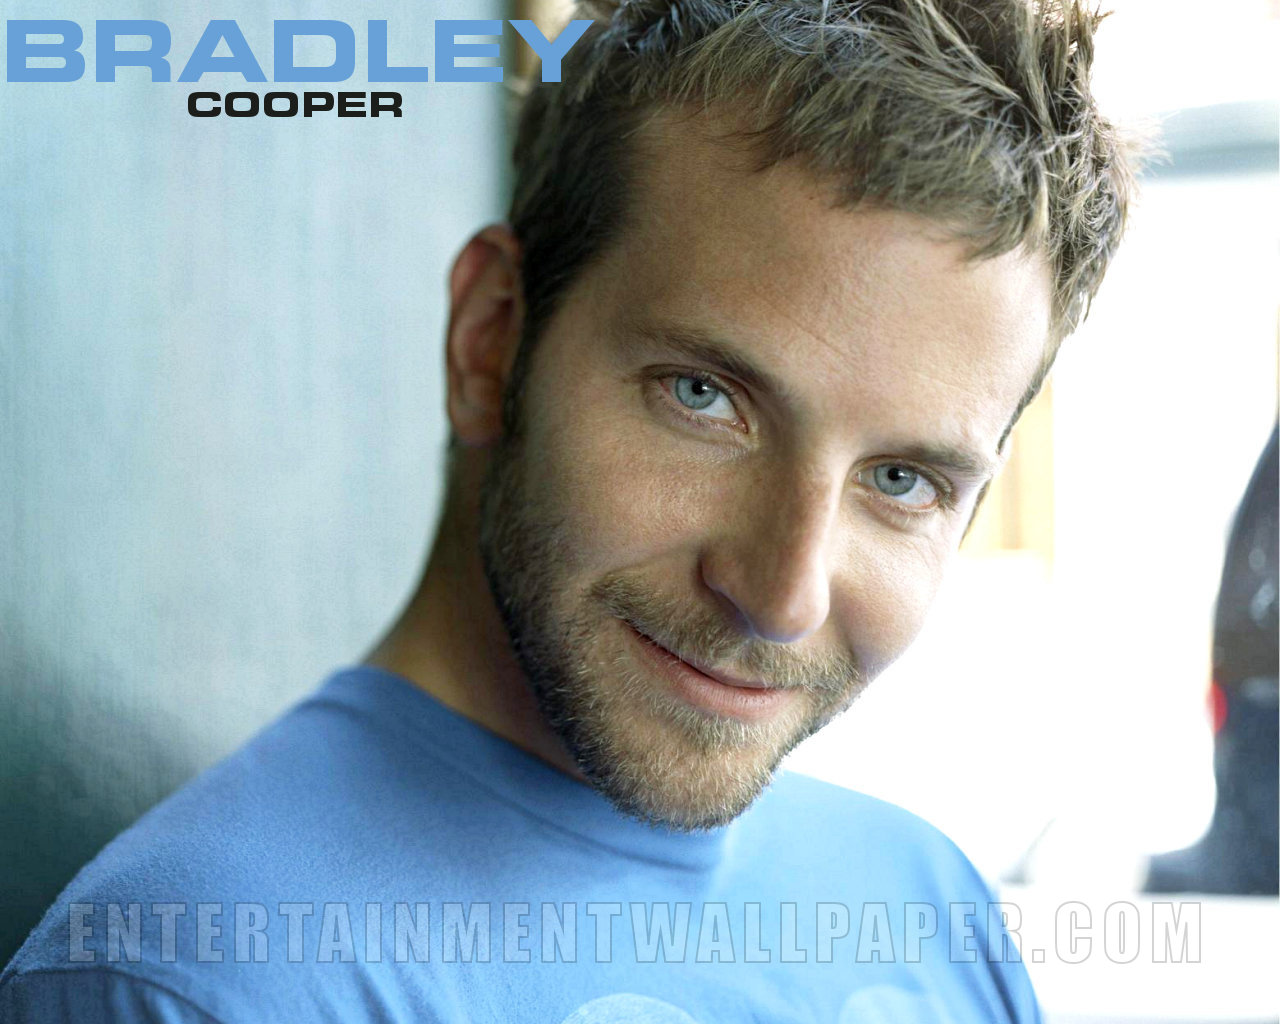 bradley cooper   Bradley Cooper Wallpaper 23904607 1280x1024